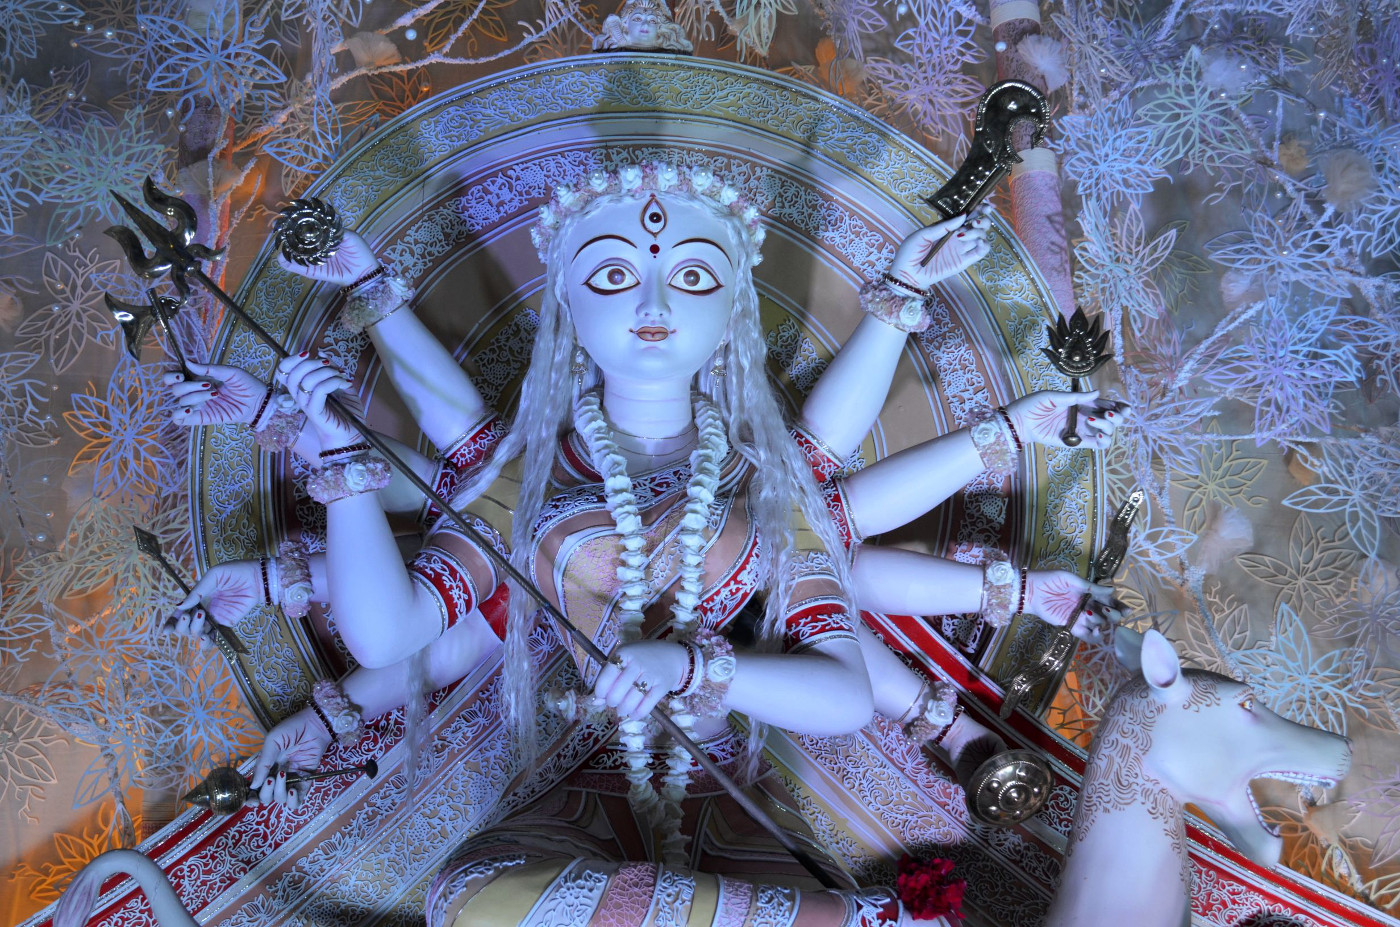 Devi exuding empathy, Kolkata Durga Puja 2015